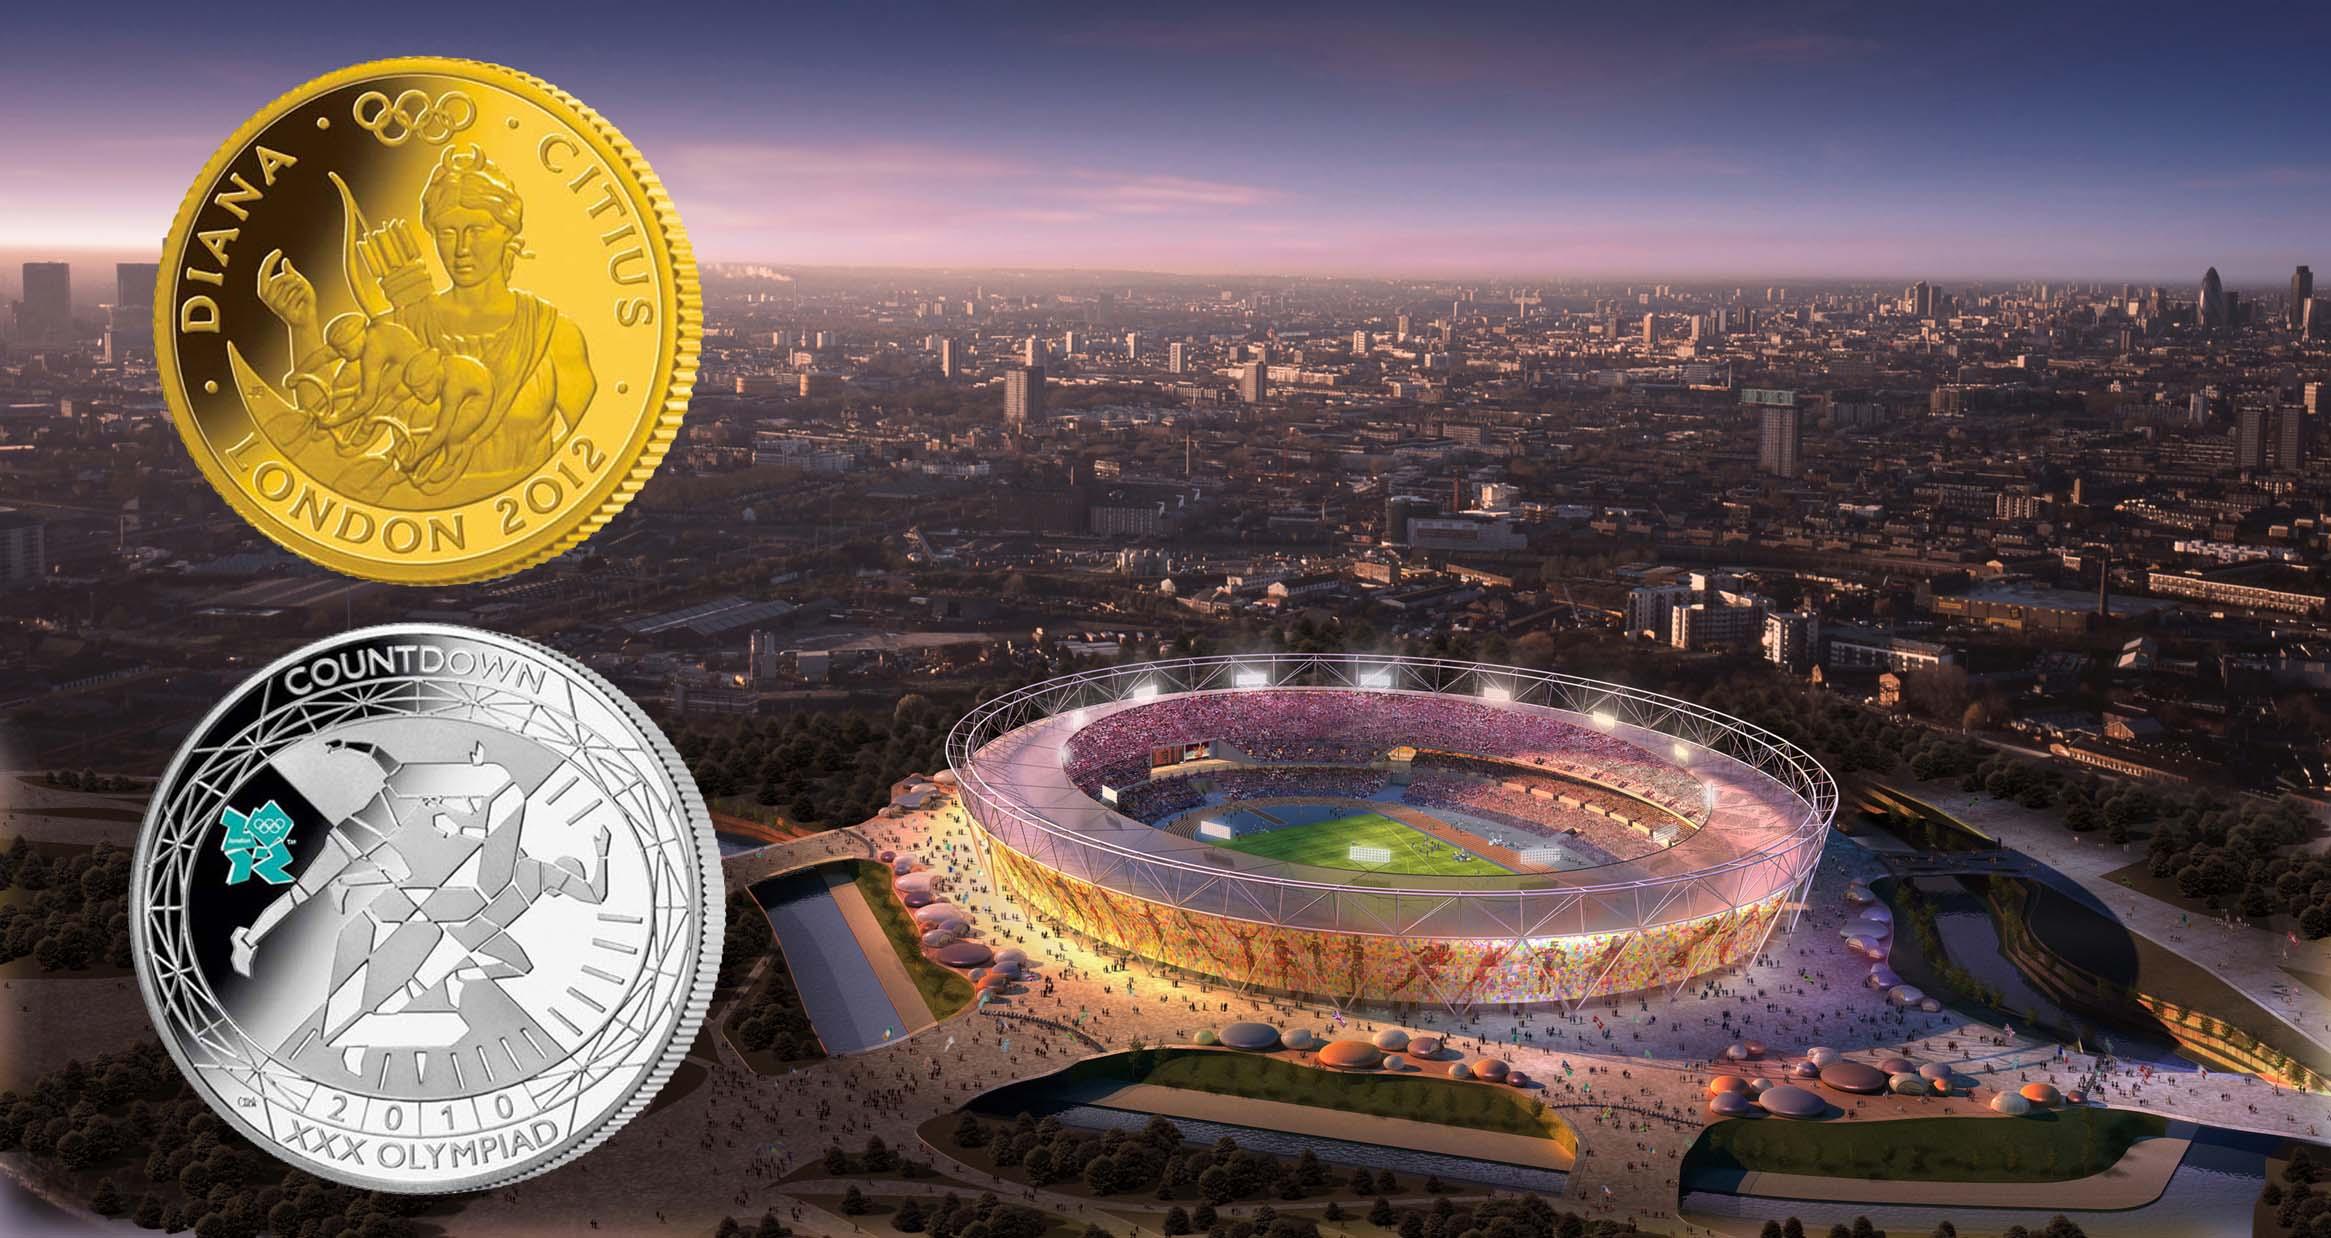 olympia medaillen spiegel 2011 hobbytennistour